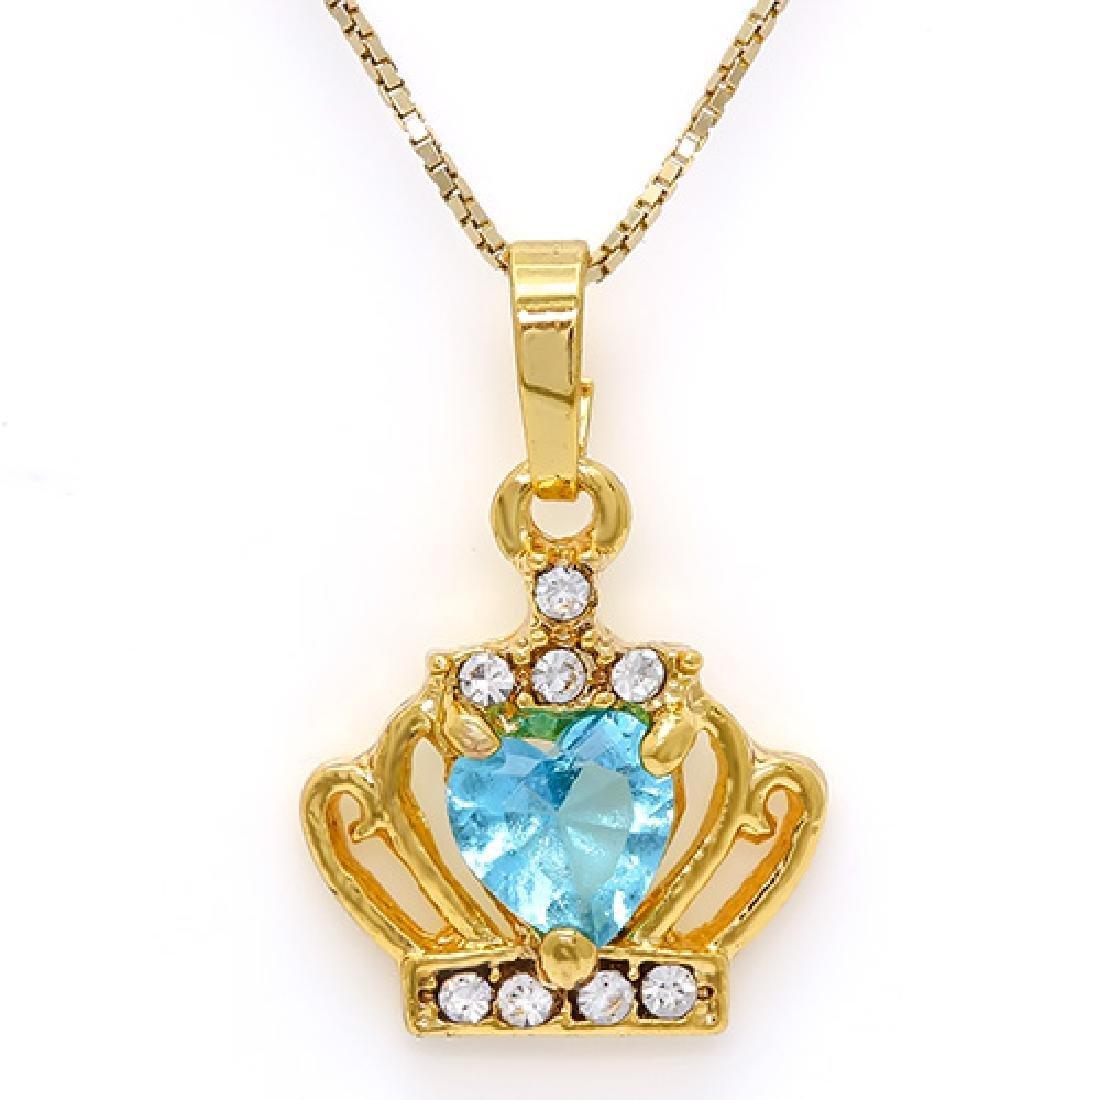 CREATED SWISS BLUE TOPAZ & FLAWLESS CREATED DIAMOND 18K